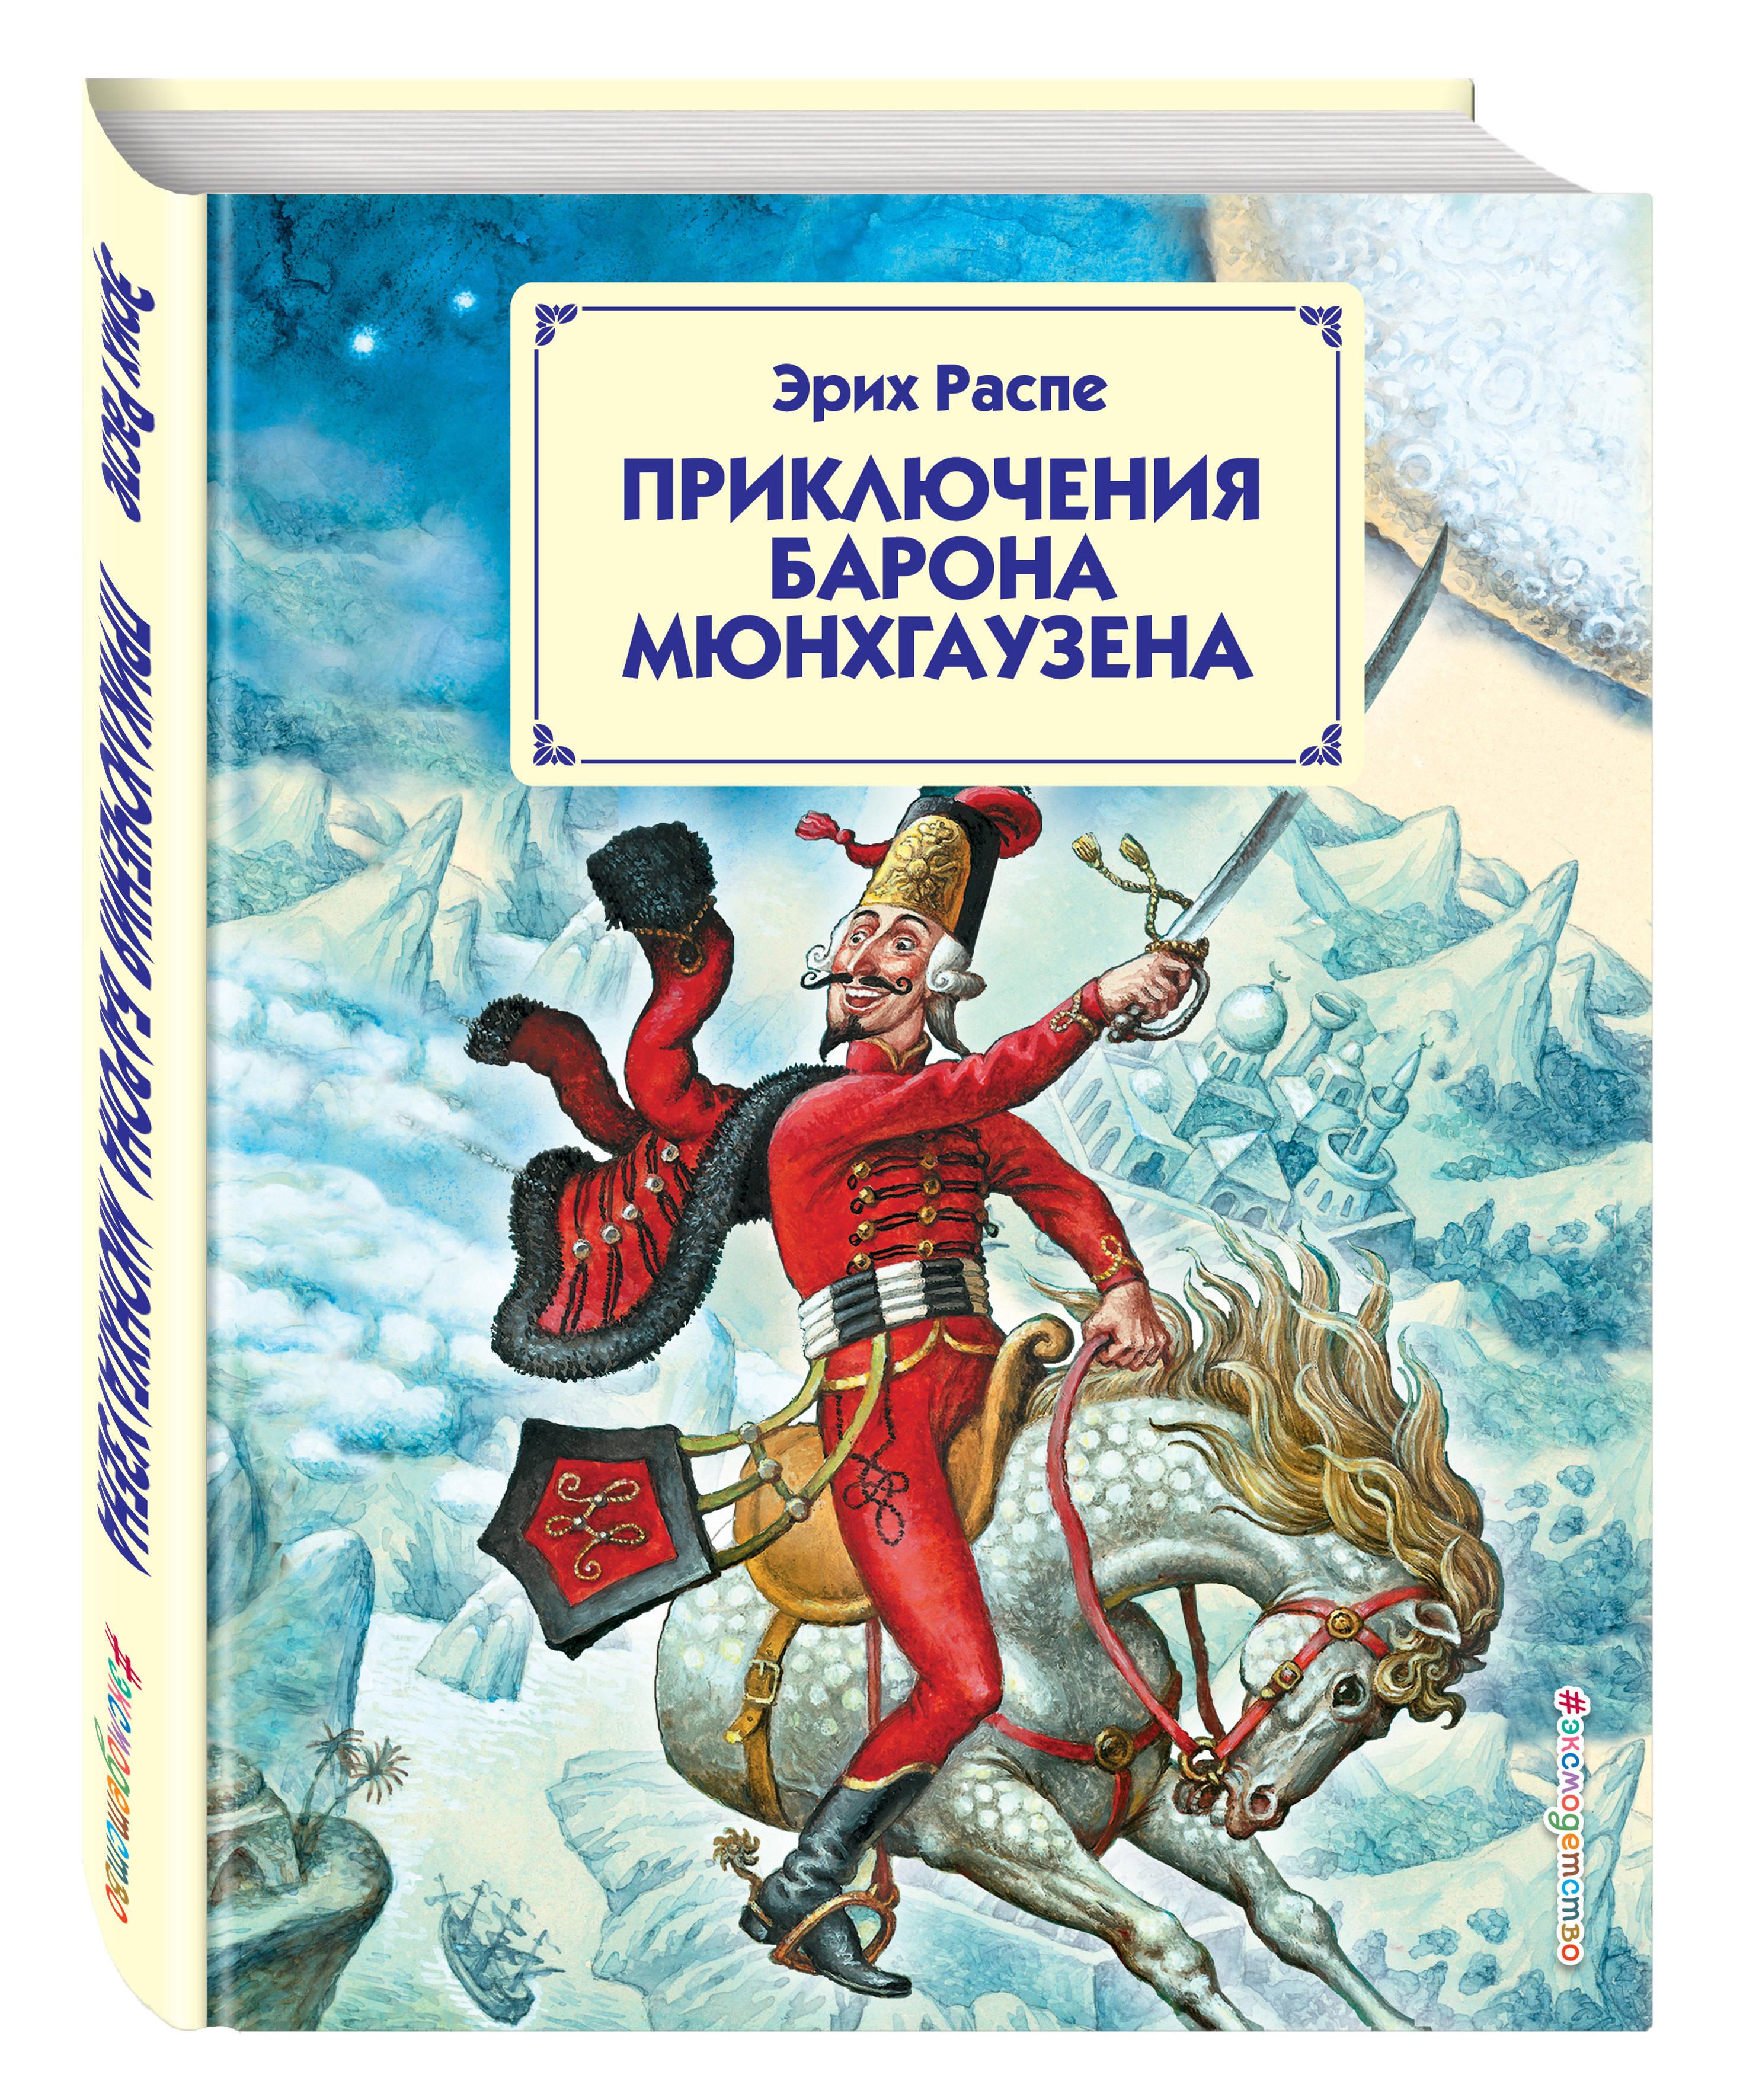 Приключения барона Мюнхгаузена (ил. И. Егунова)